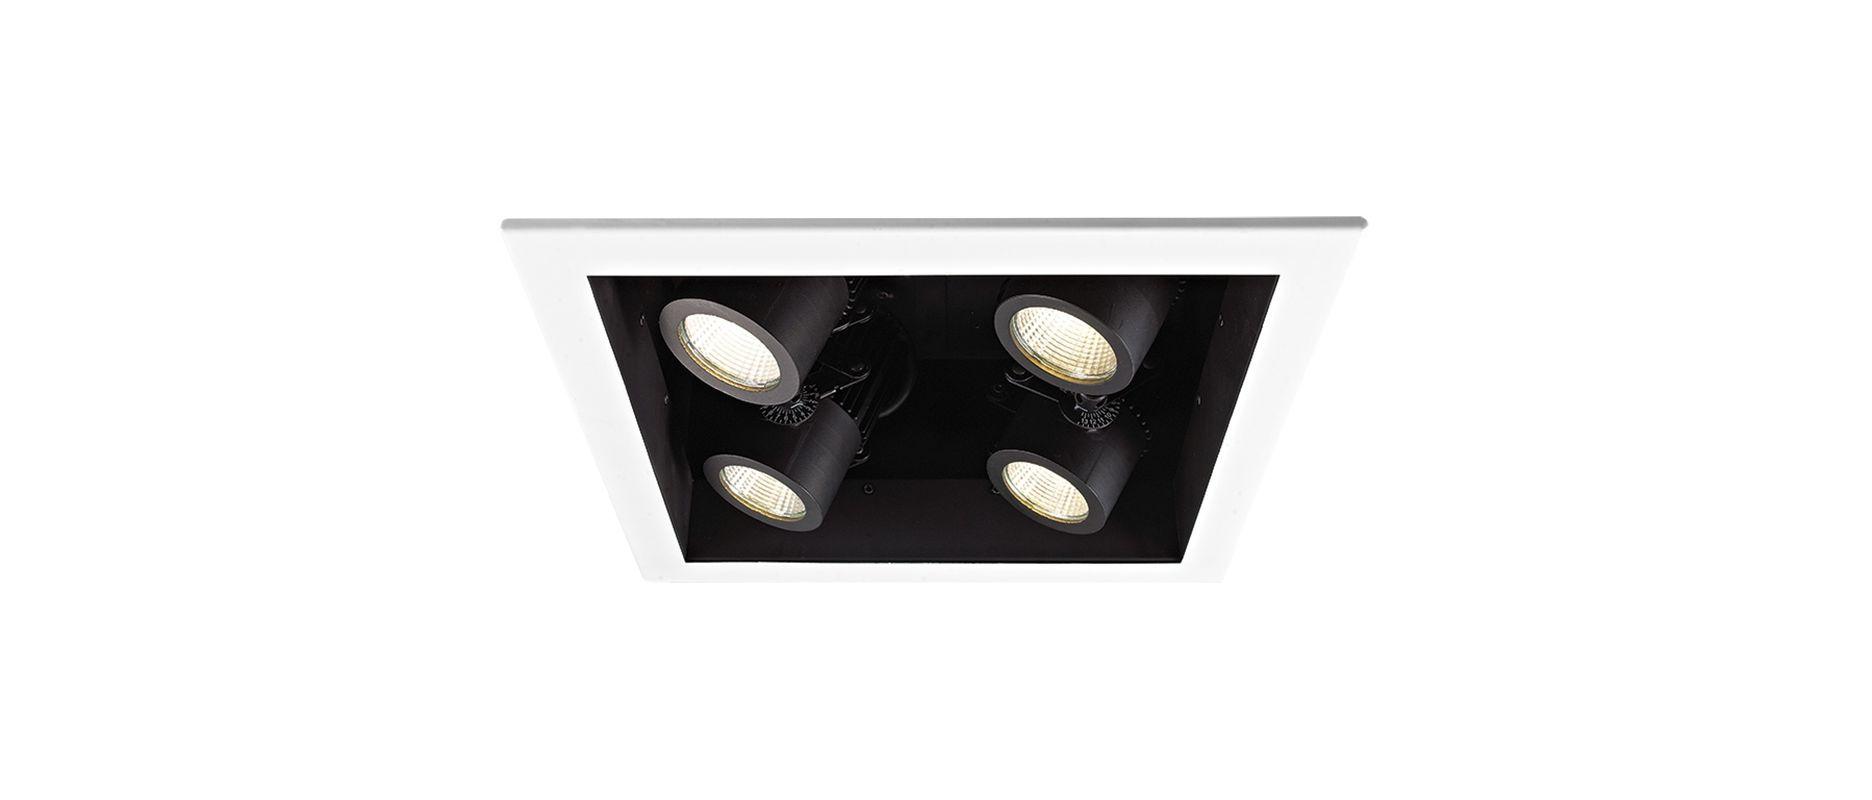 WAC Lighting MT-4LD226N-S30 4 Light Energy Star 3000K High Output LED